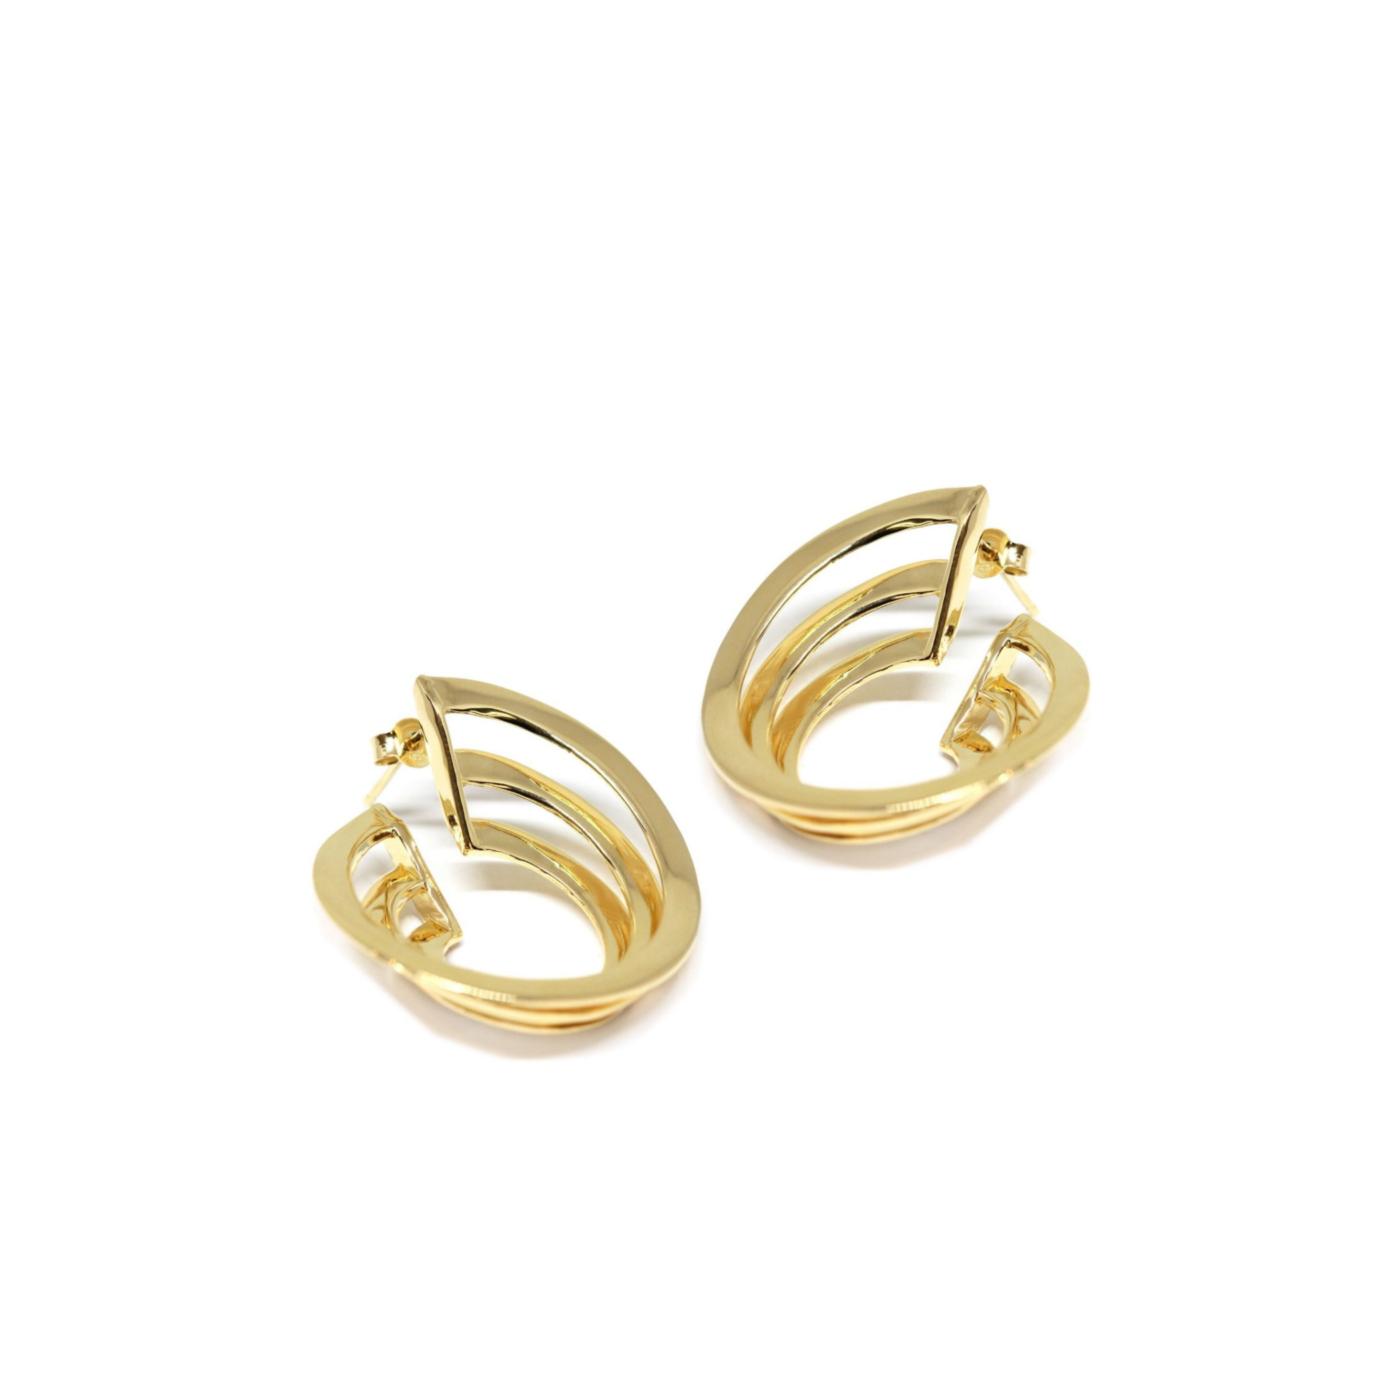 Vortex Guggenheim Earrings Gold Plated